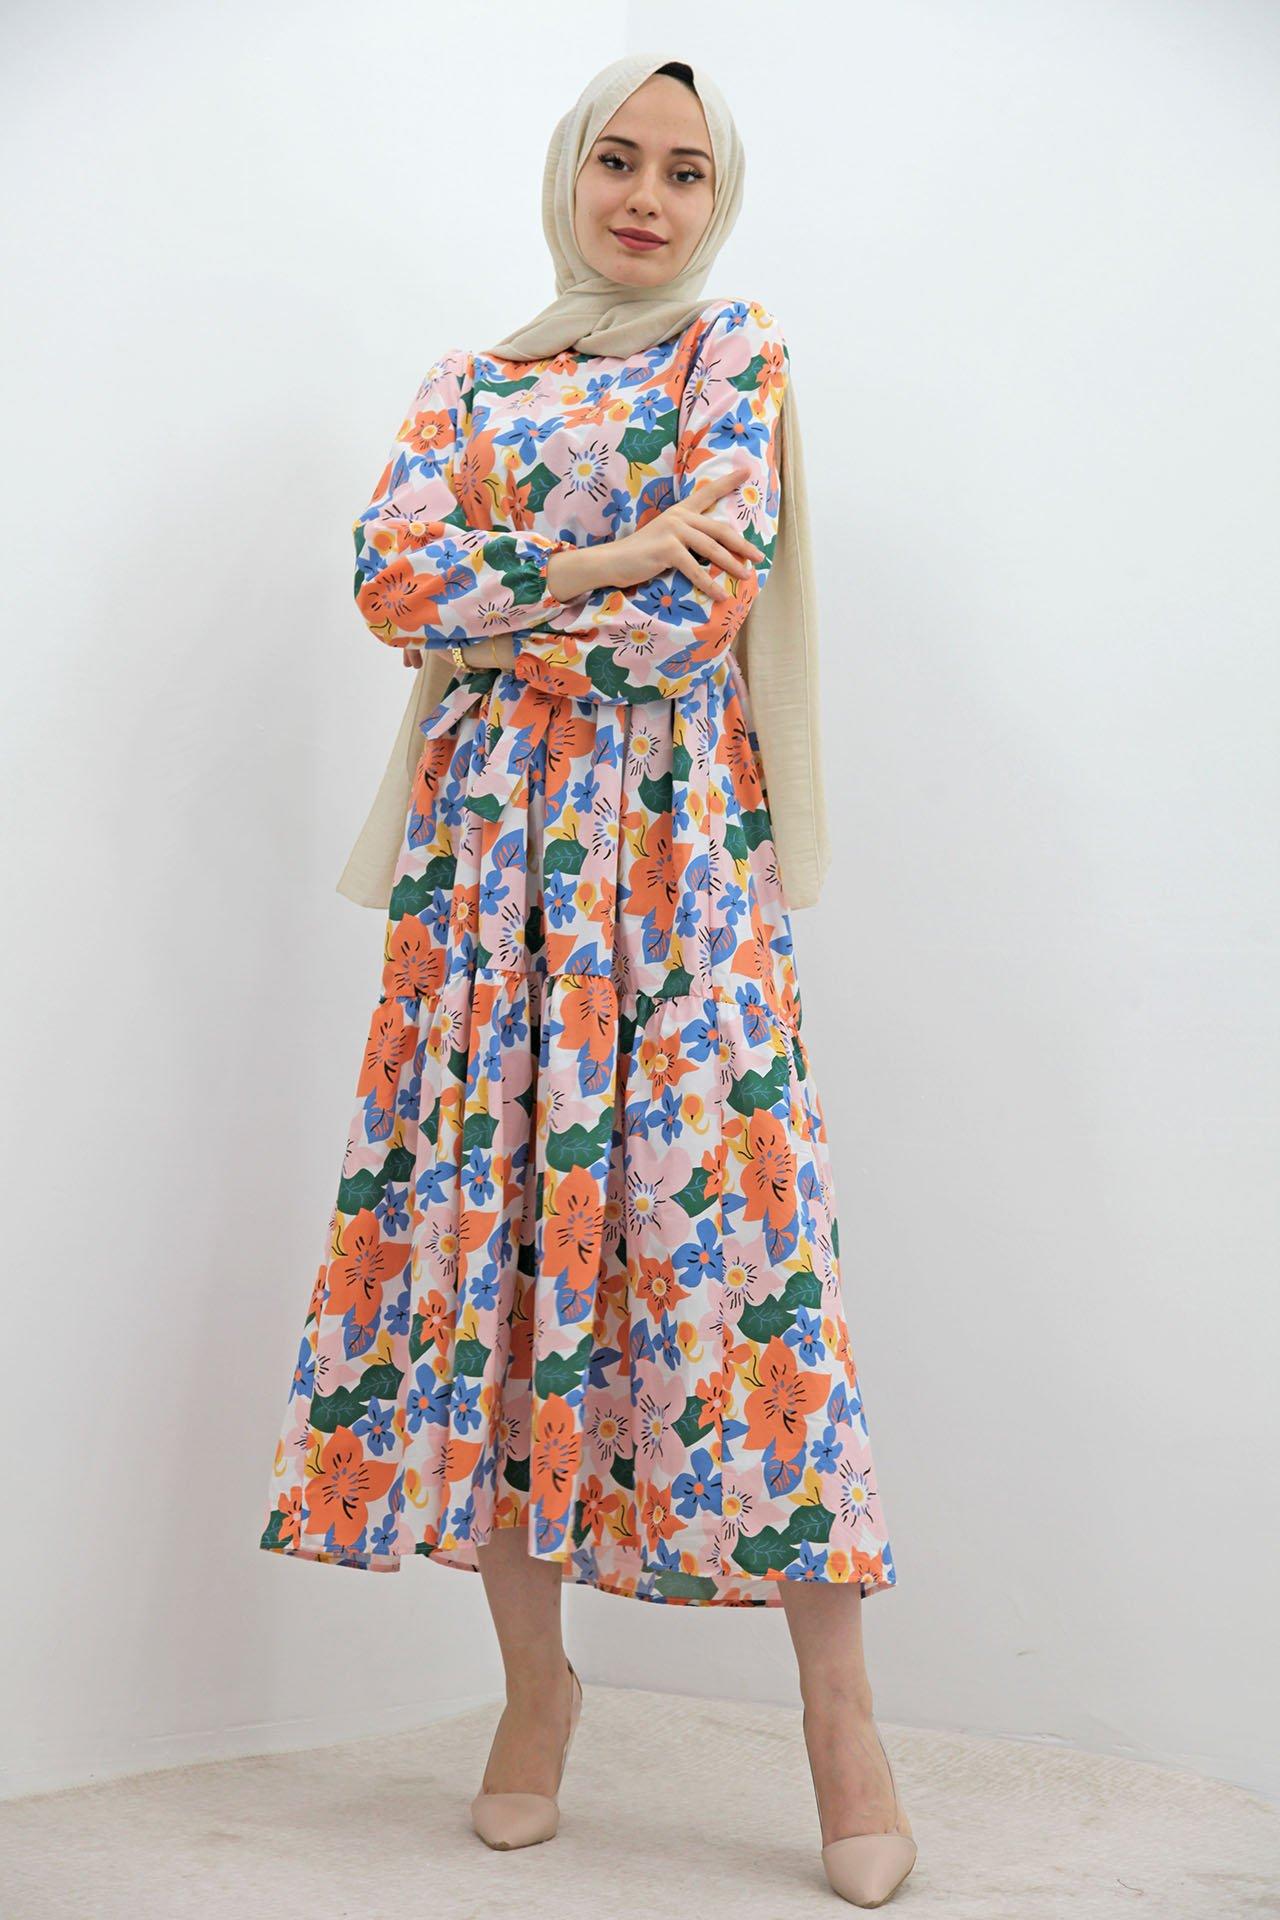 GİZAGİYİM - Renkli Çiçekli Elbise Pudra